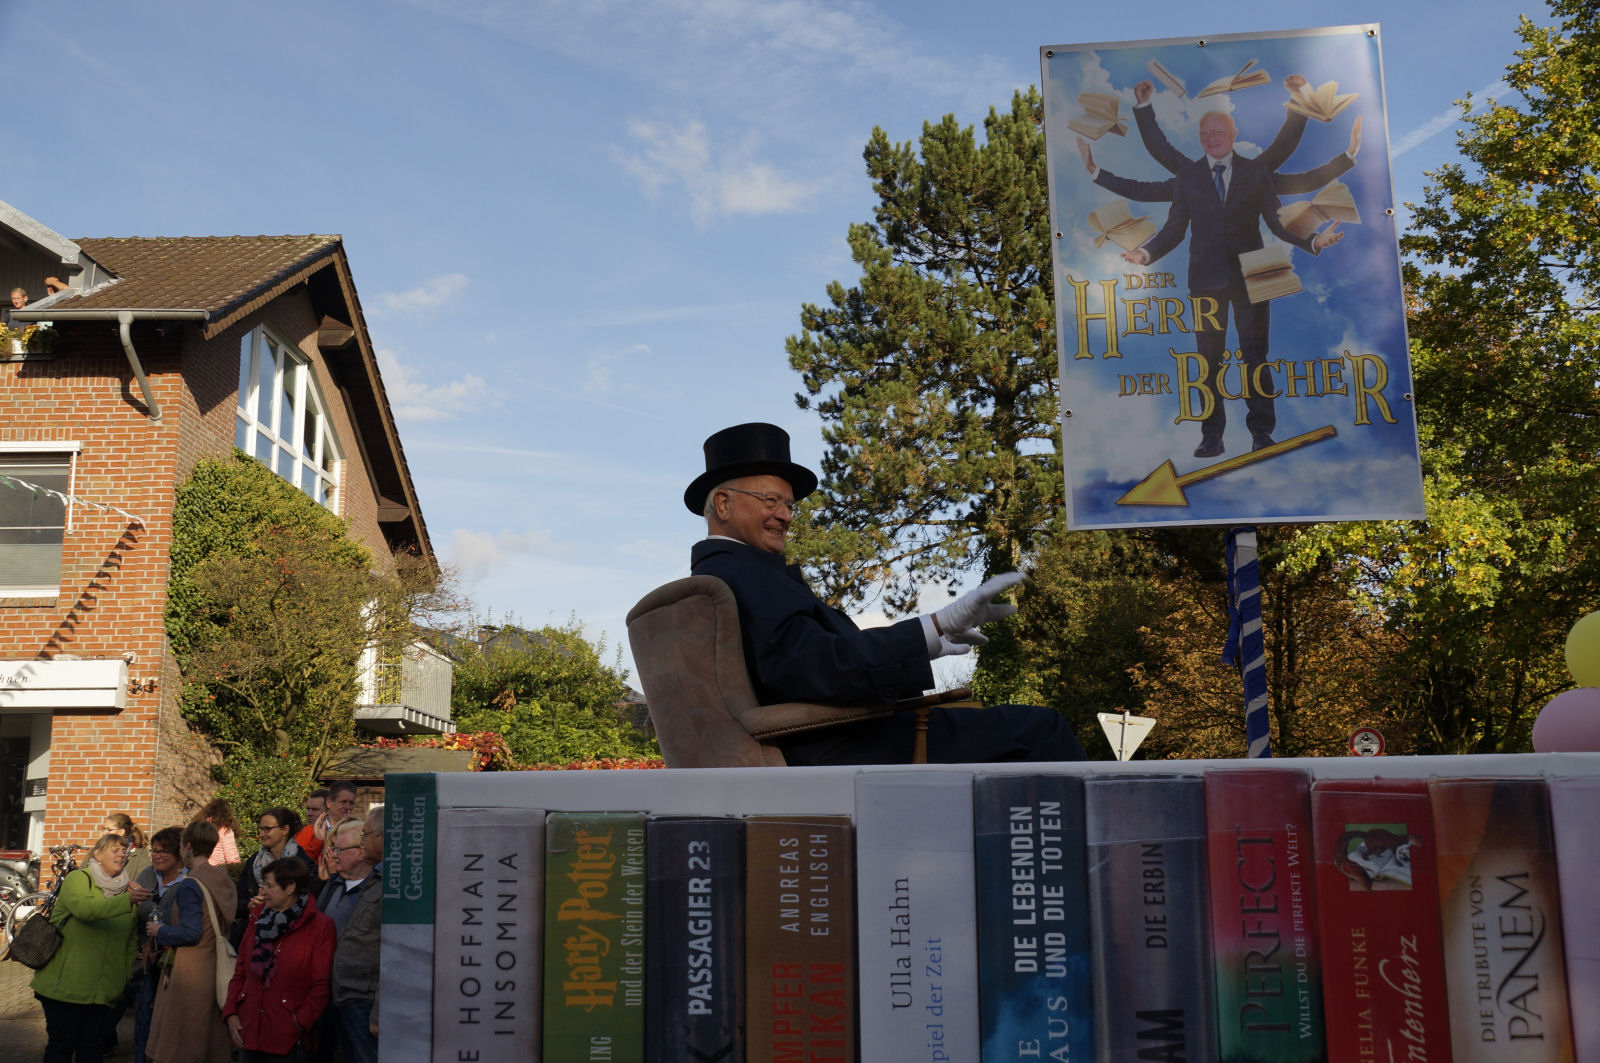 KÖB, Willi Schrudde, Bücherei